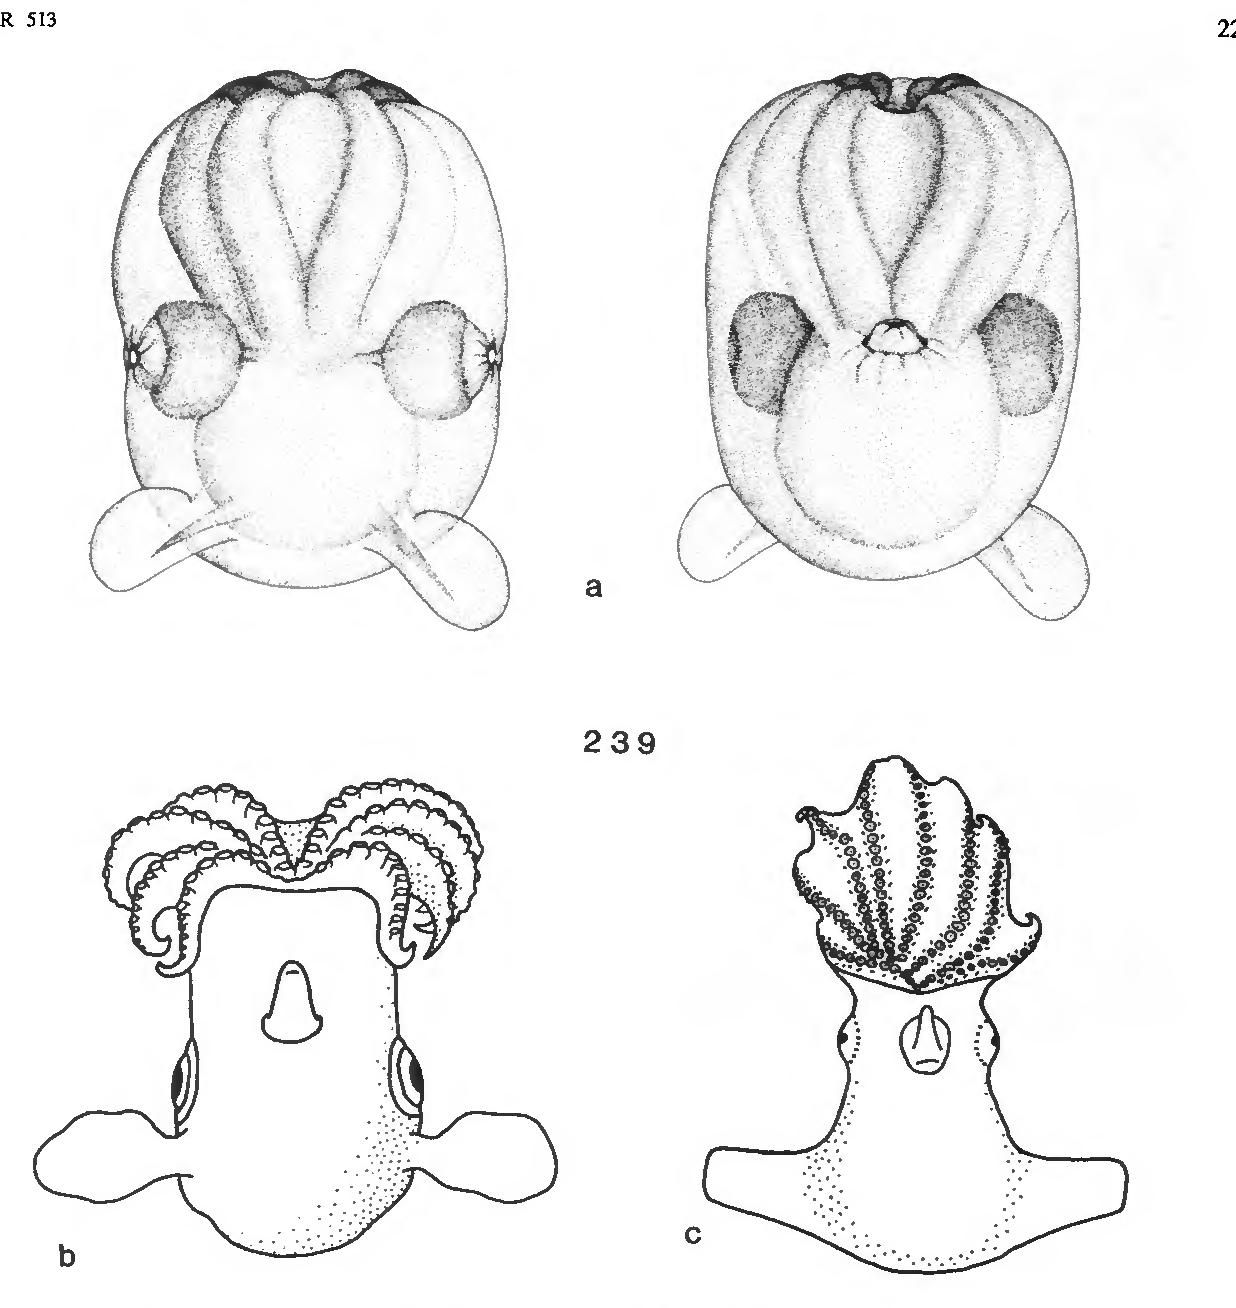 figure 239